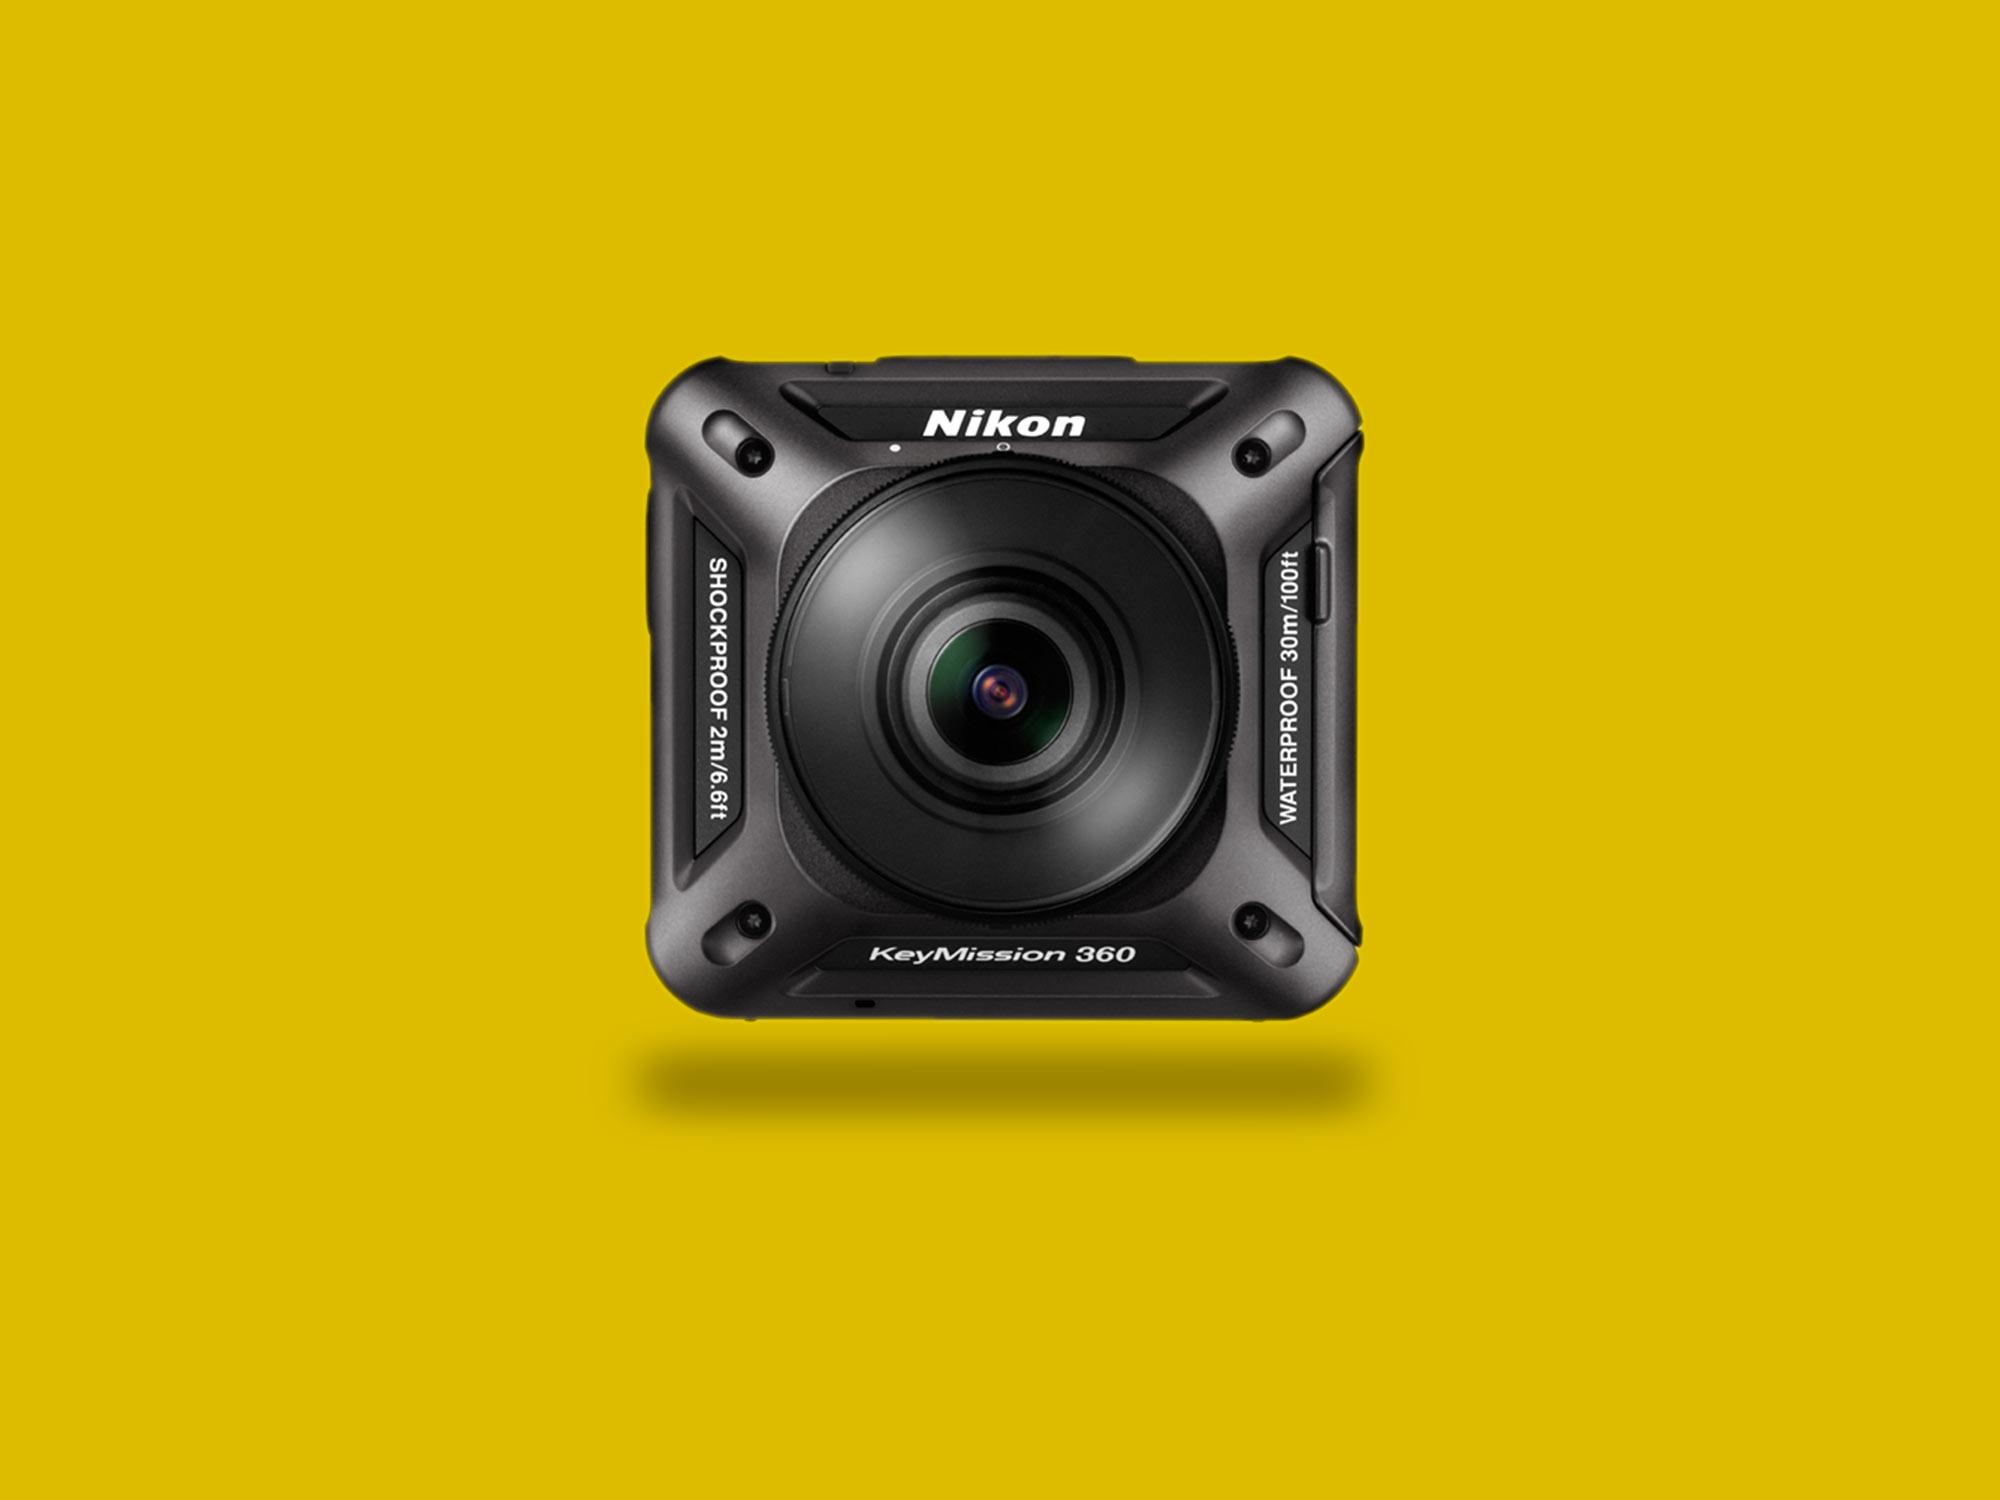 Nikon Keymission 360 firmware 1.6